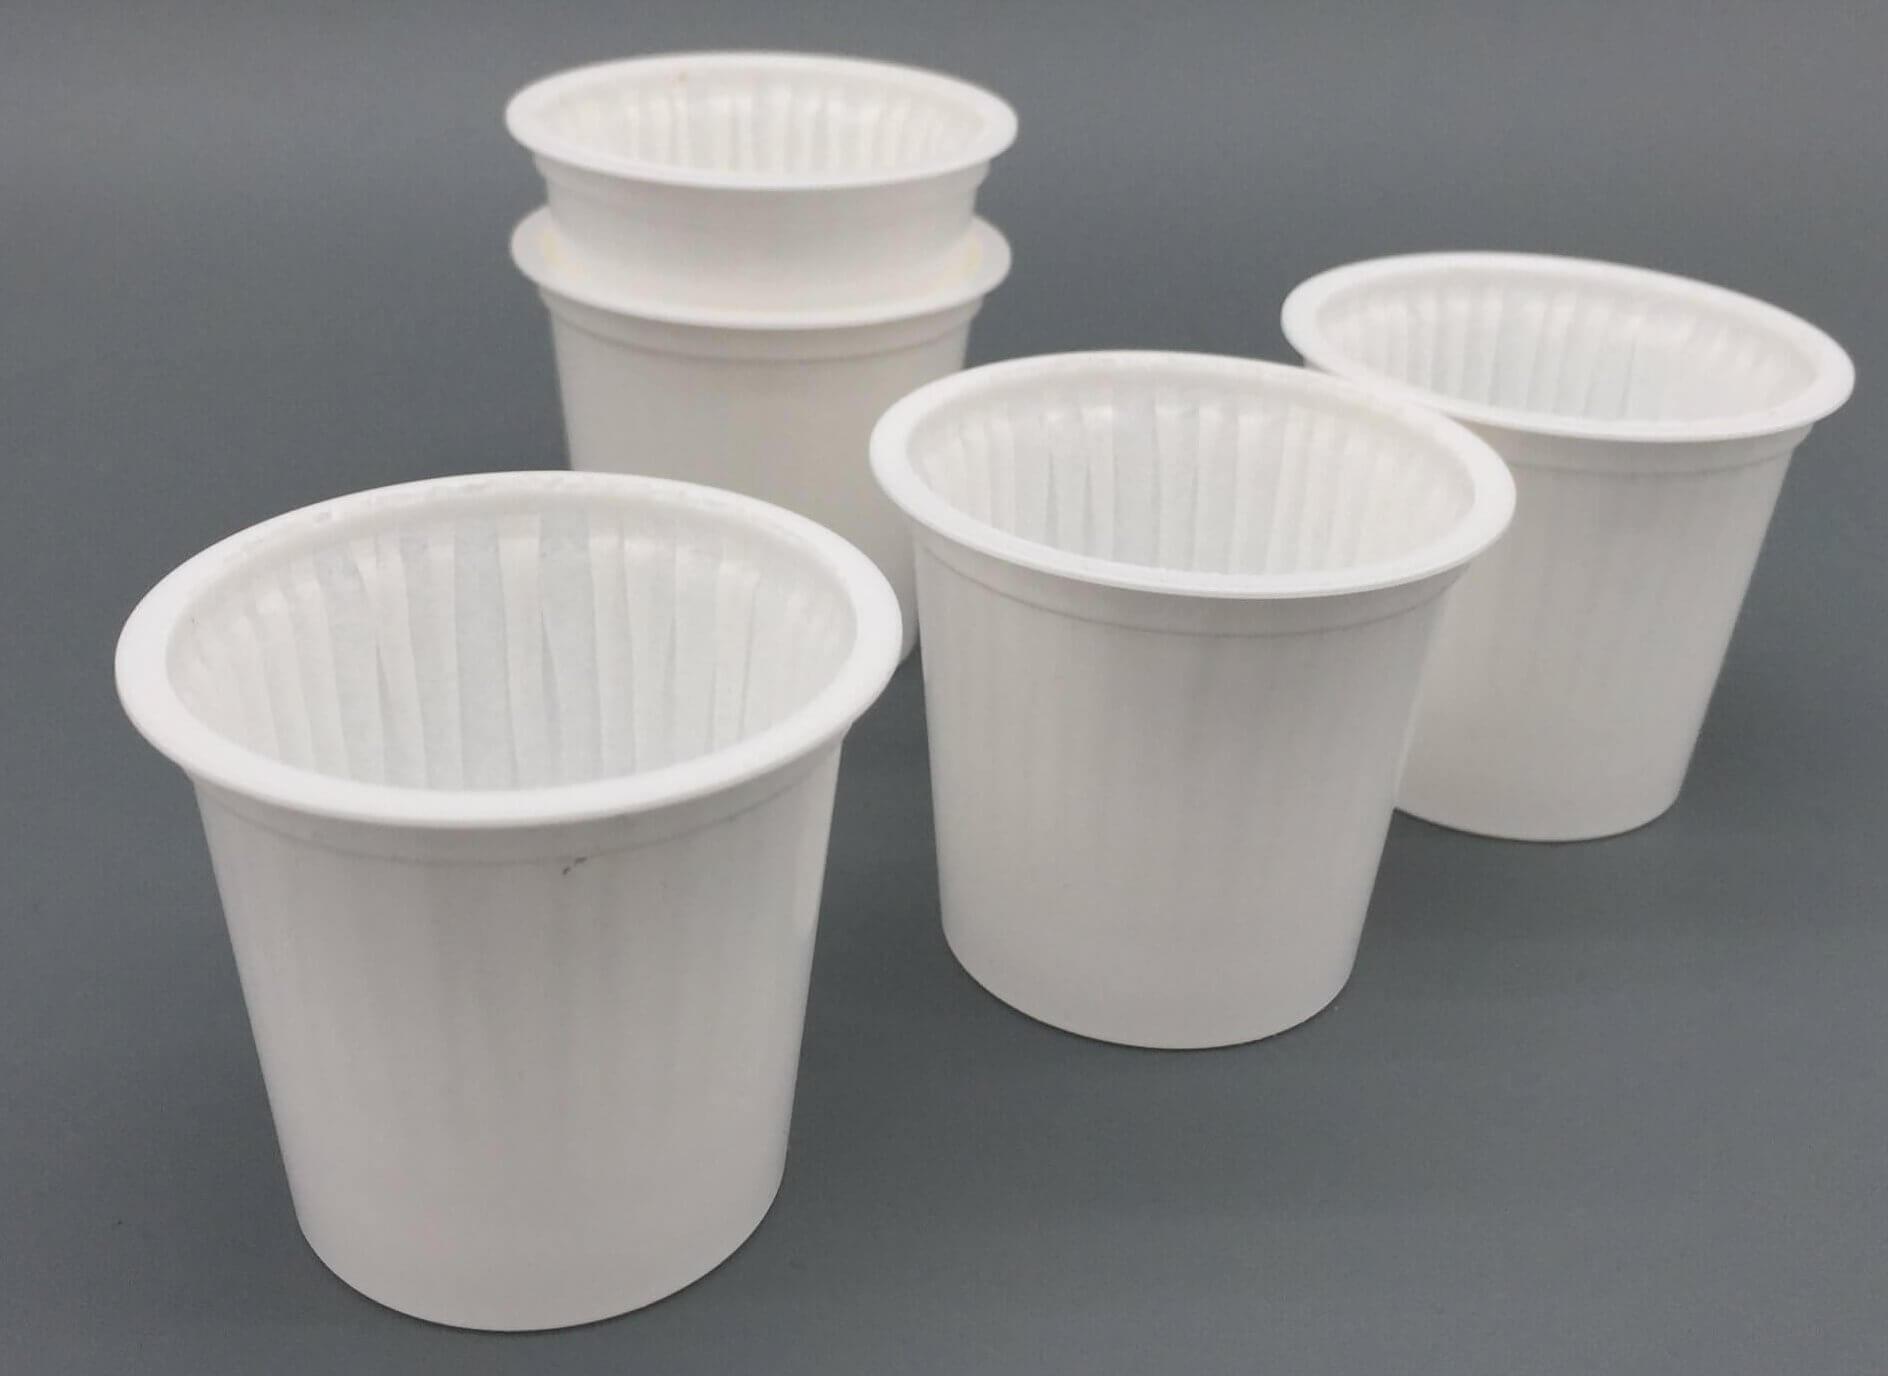 empty K cups for keurig capsules